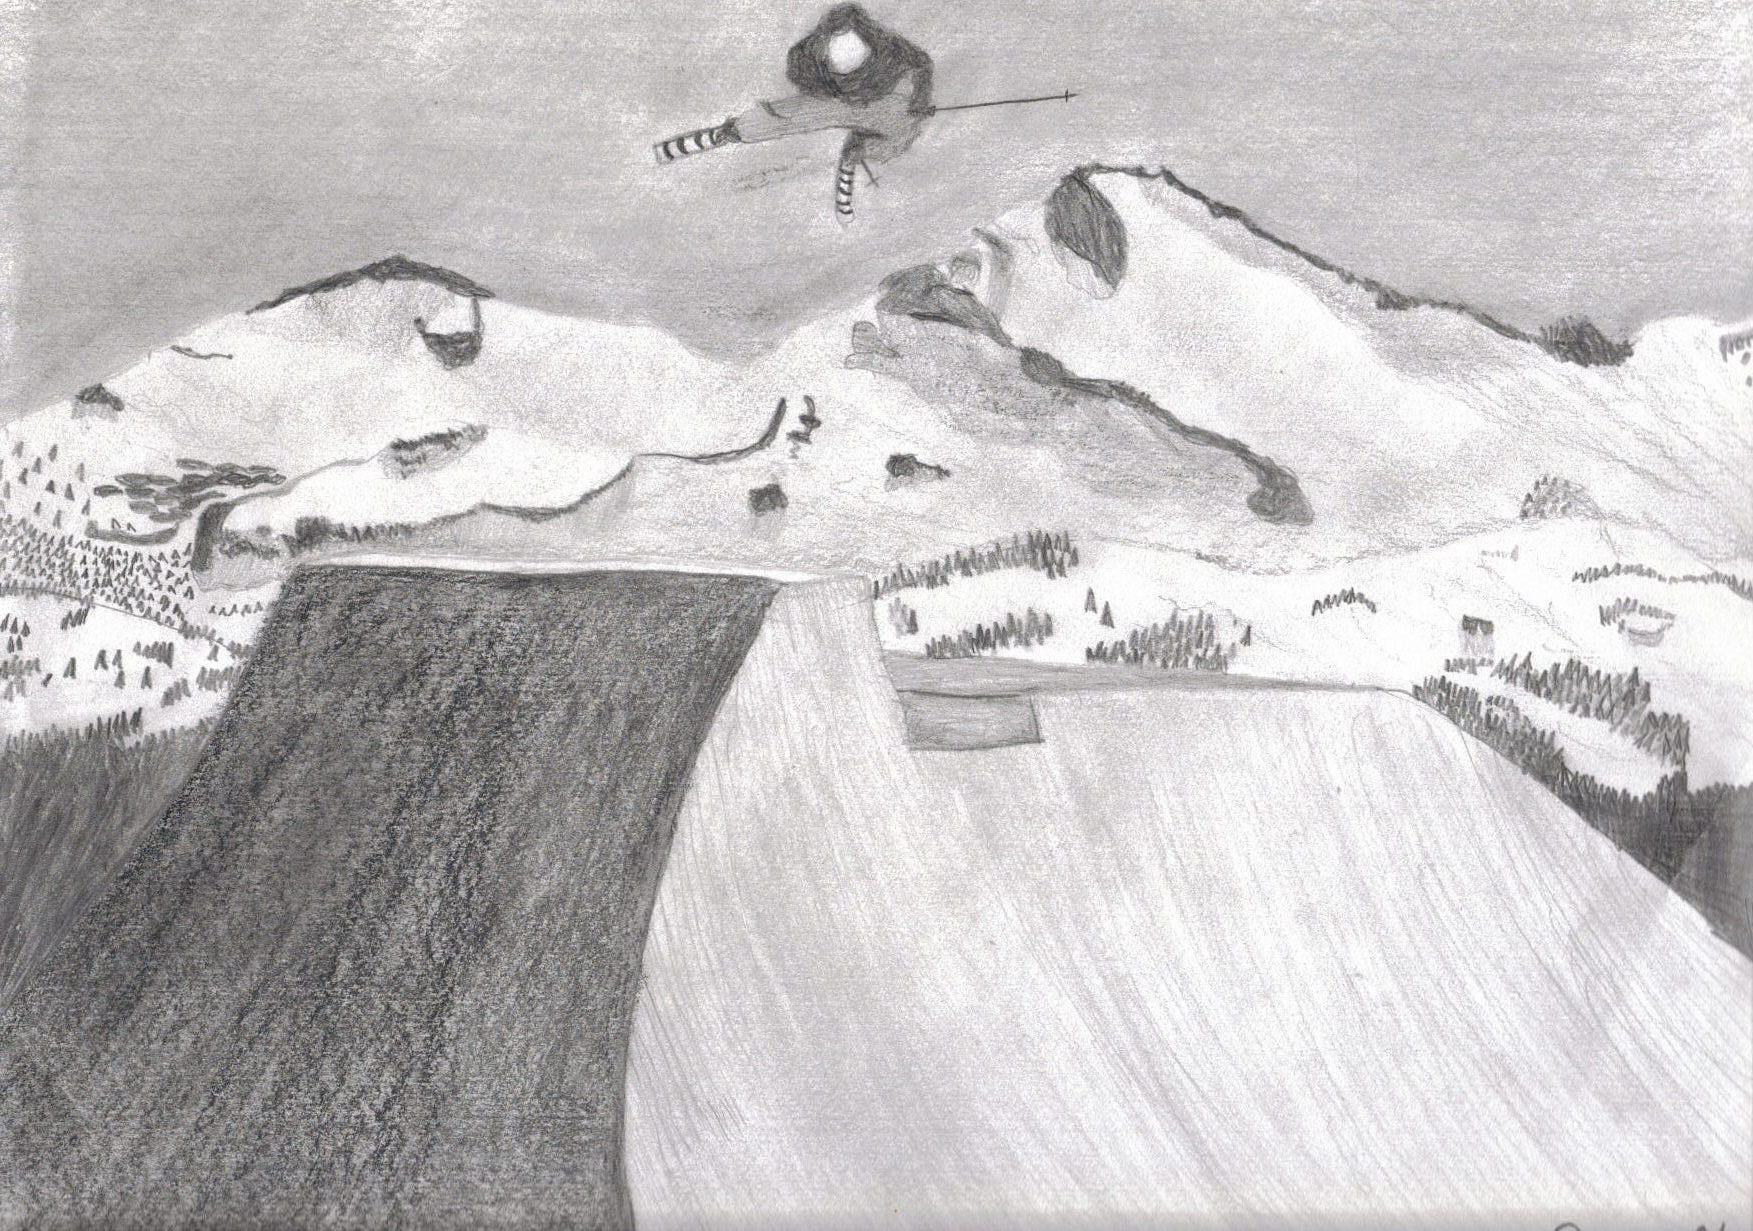 Skiing sketch